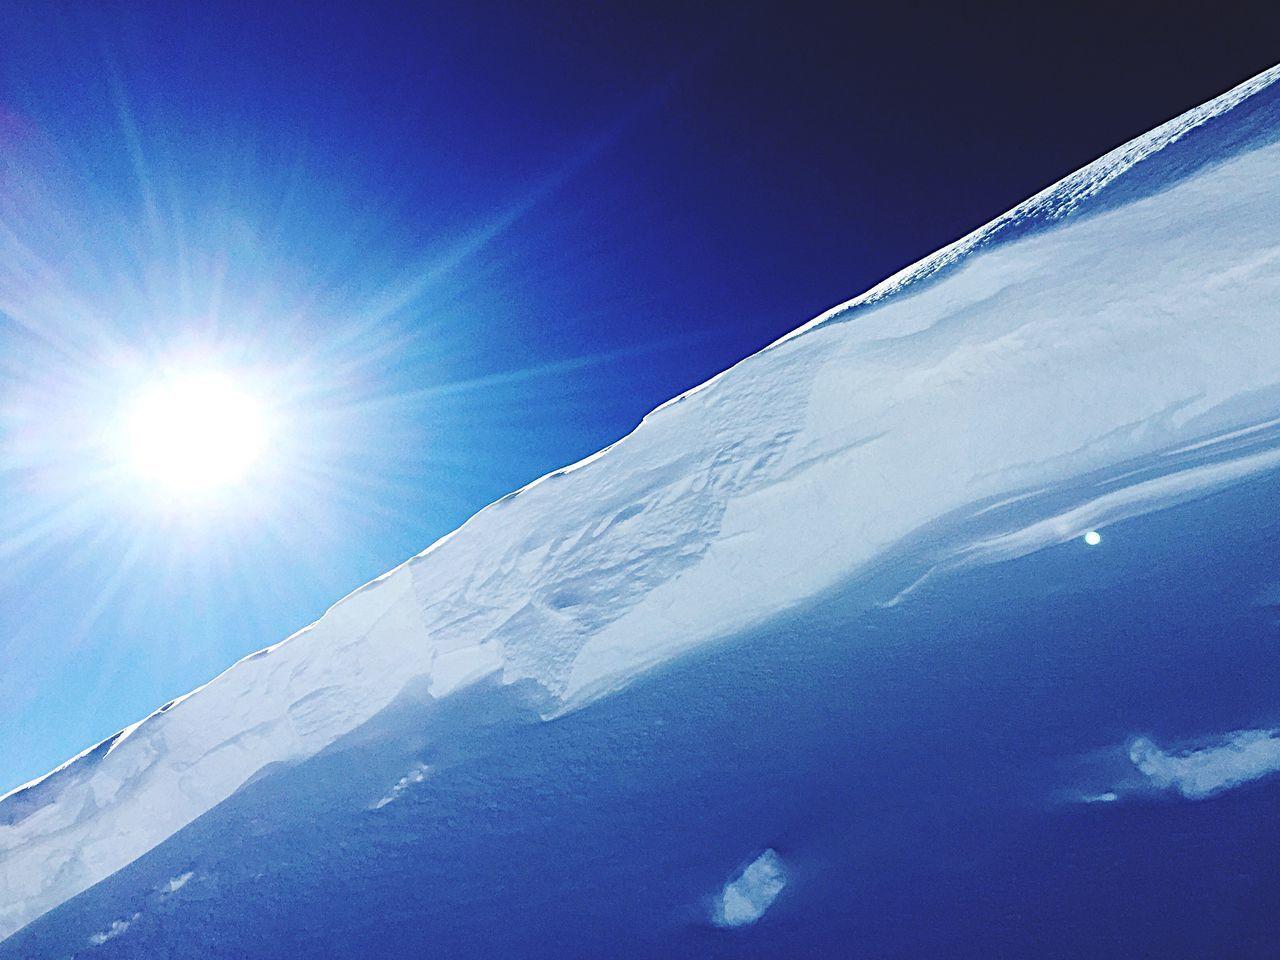 Snow edge, Tignes, 2015 Snow ❄ Edge Cold Blue Sky Wintertime Snowfun!